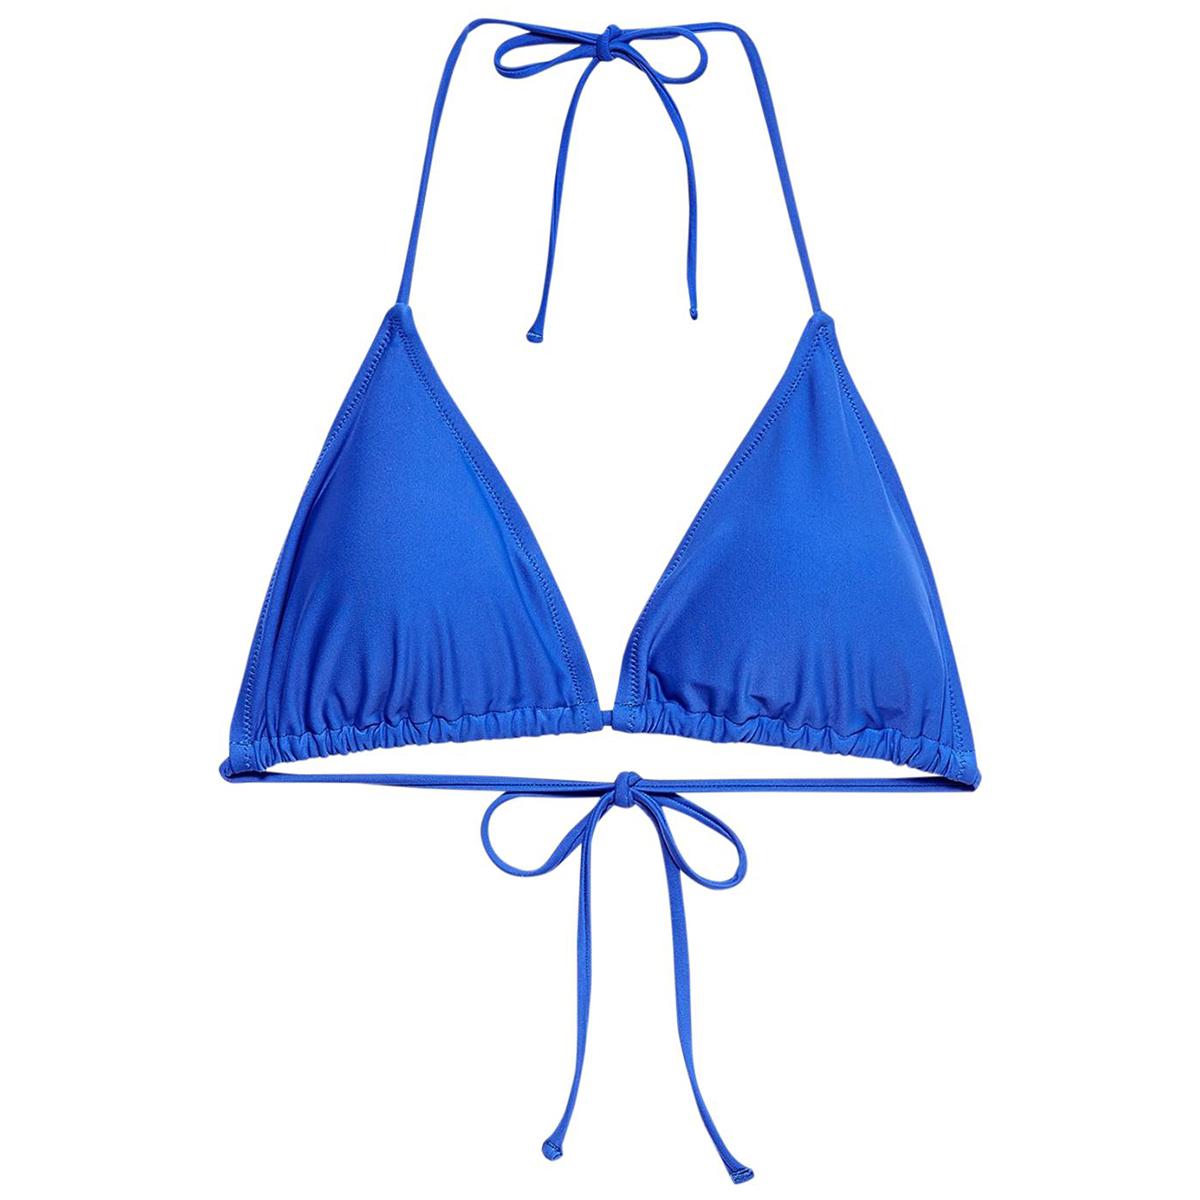 Jack Wills Women's Wilsham Bikini Top - Blue, 6